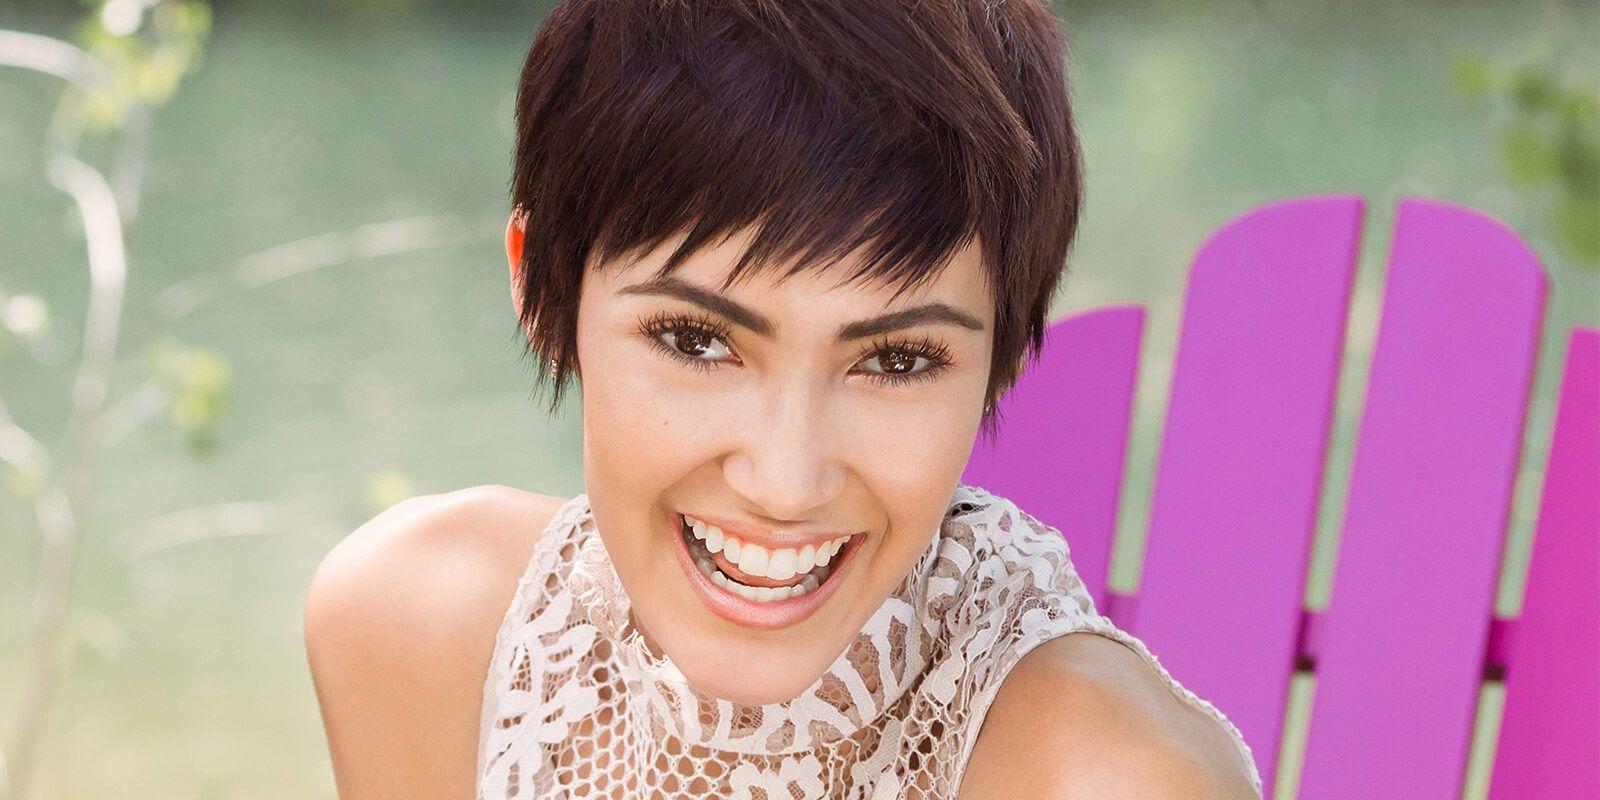 Natural Shimmer Makeup How To Beauty, Hair makeup, Ulta